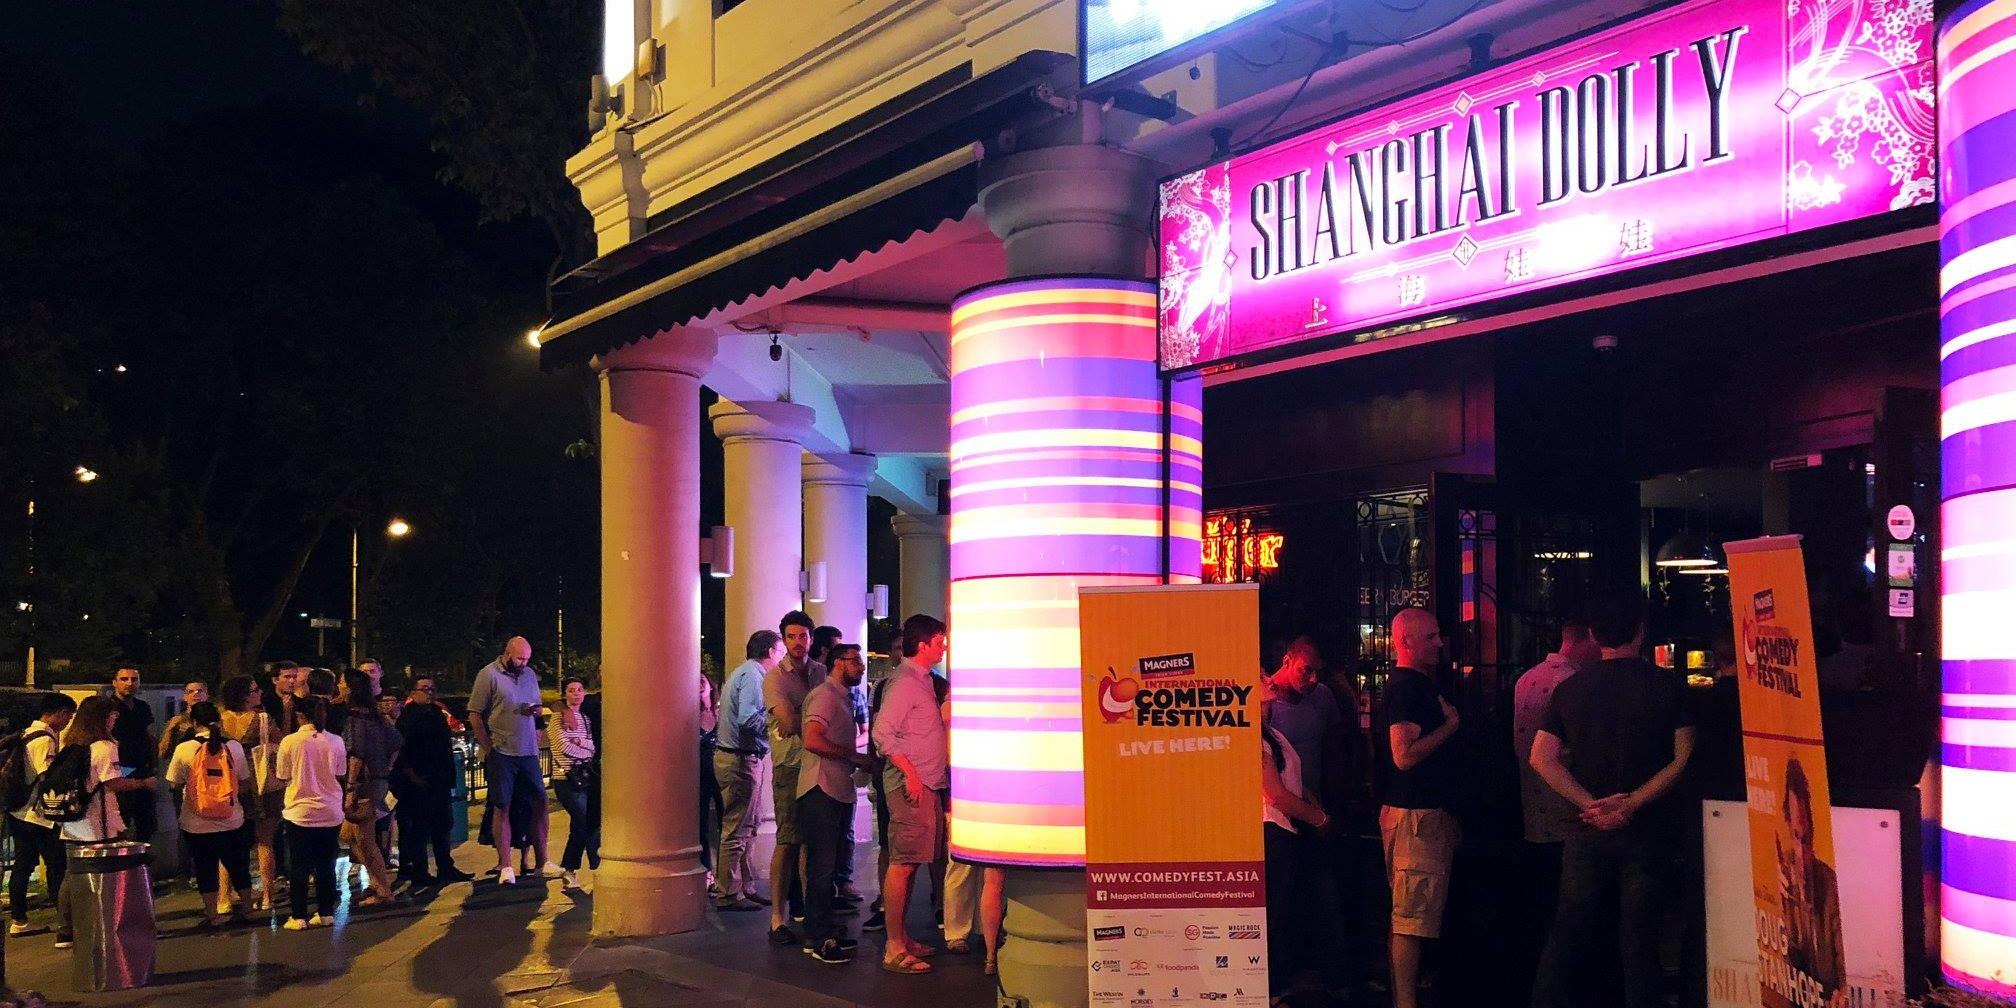 Mandopop in Singapore loses a venue in Shanghai Dolly